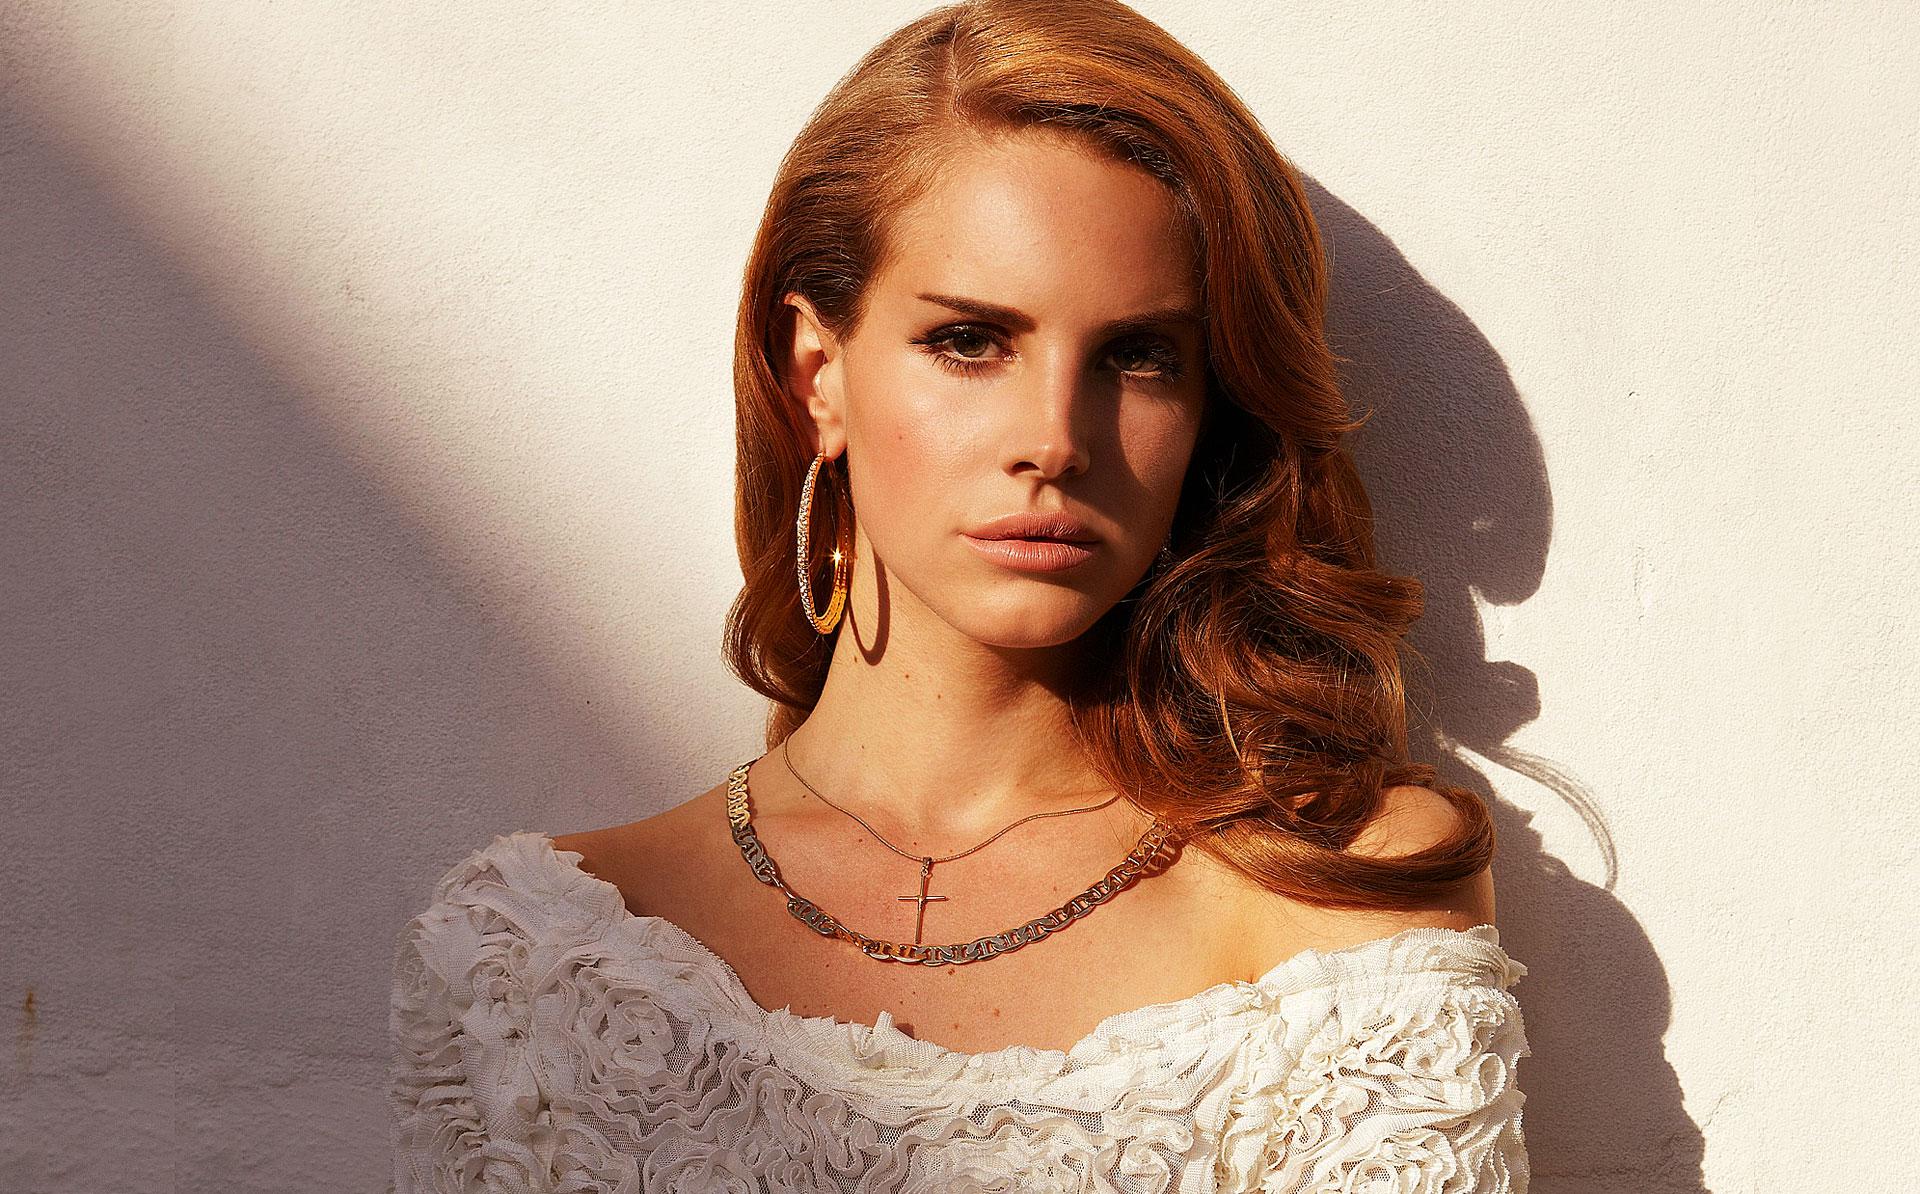 Being Lana Del Rey